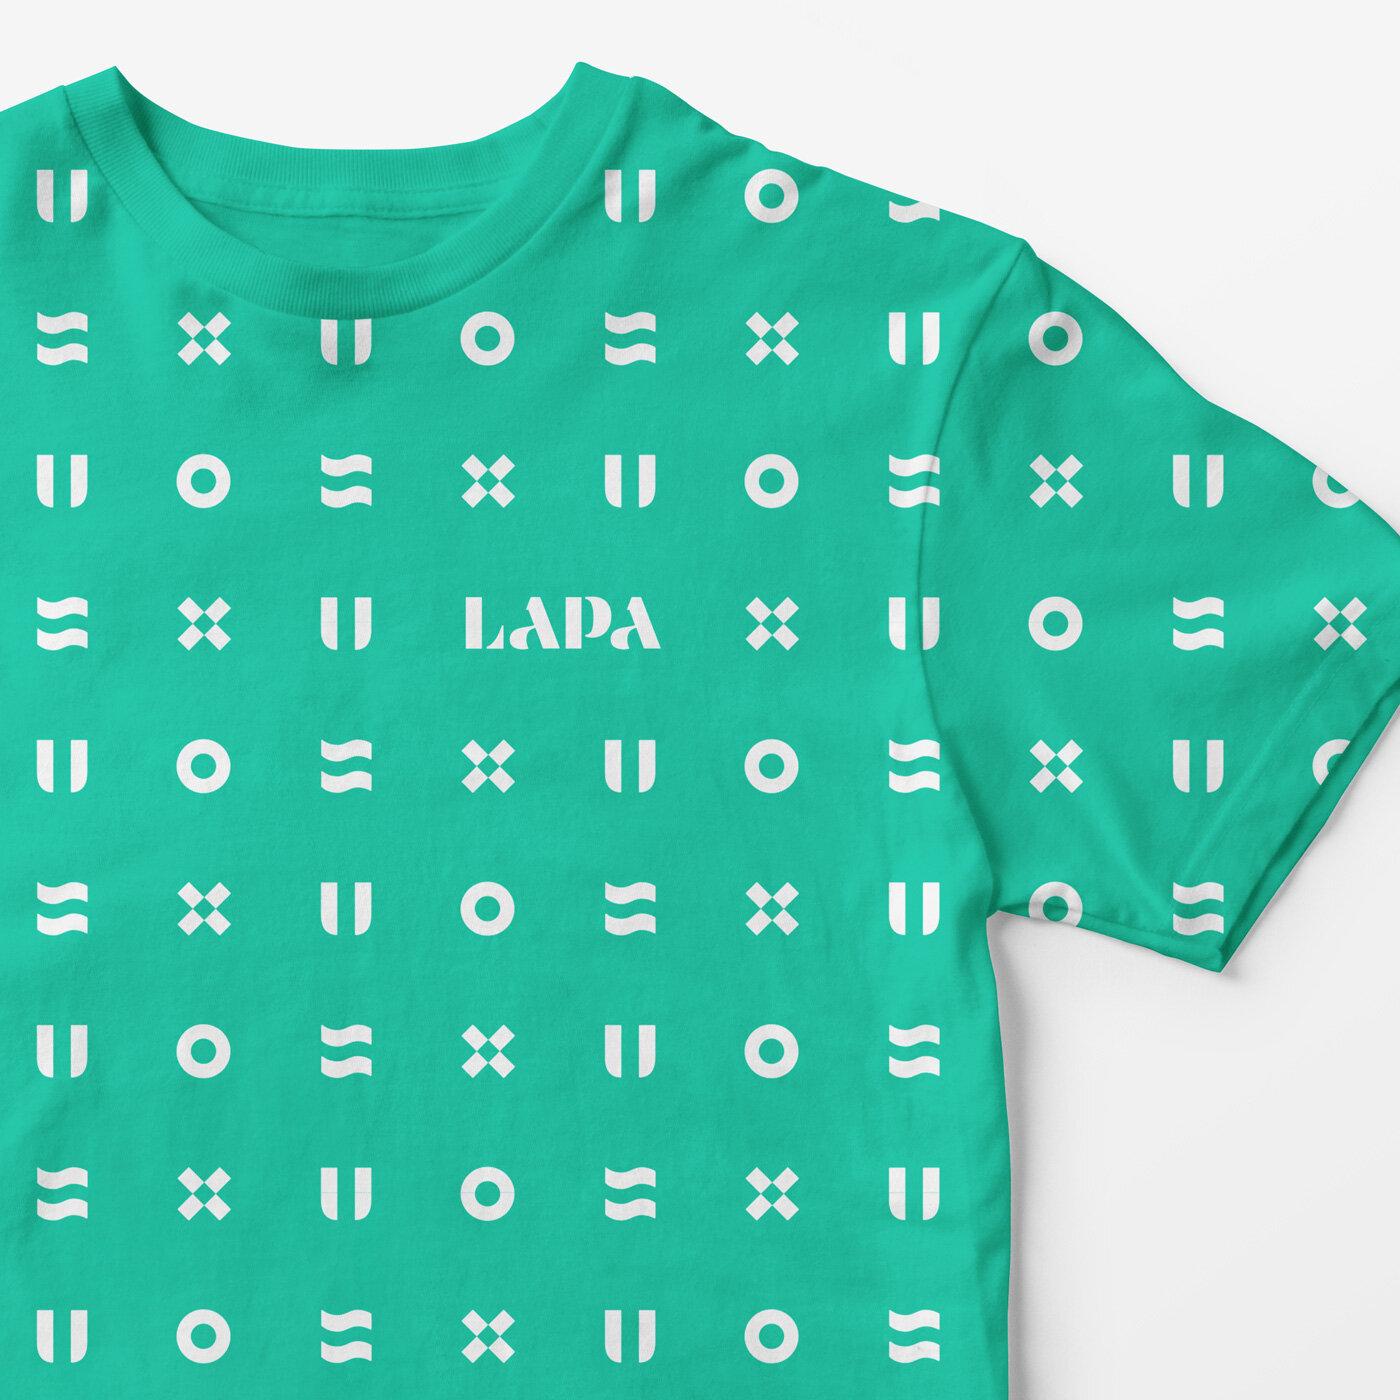 LAPA+t-shirt+by+Gen+Design+Studio.jpg